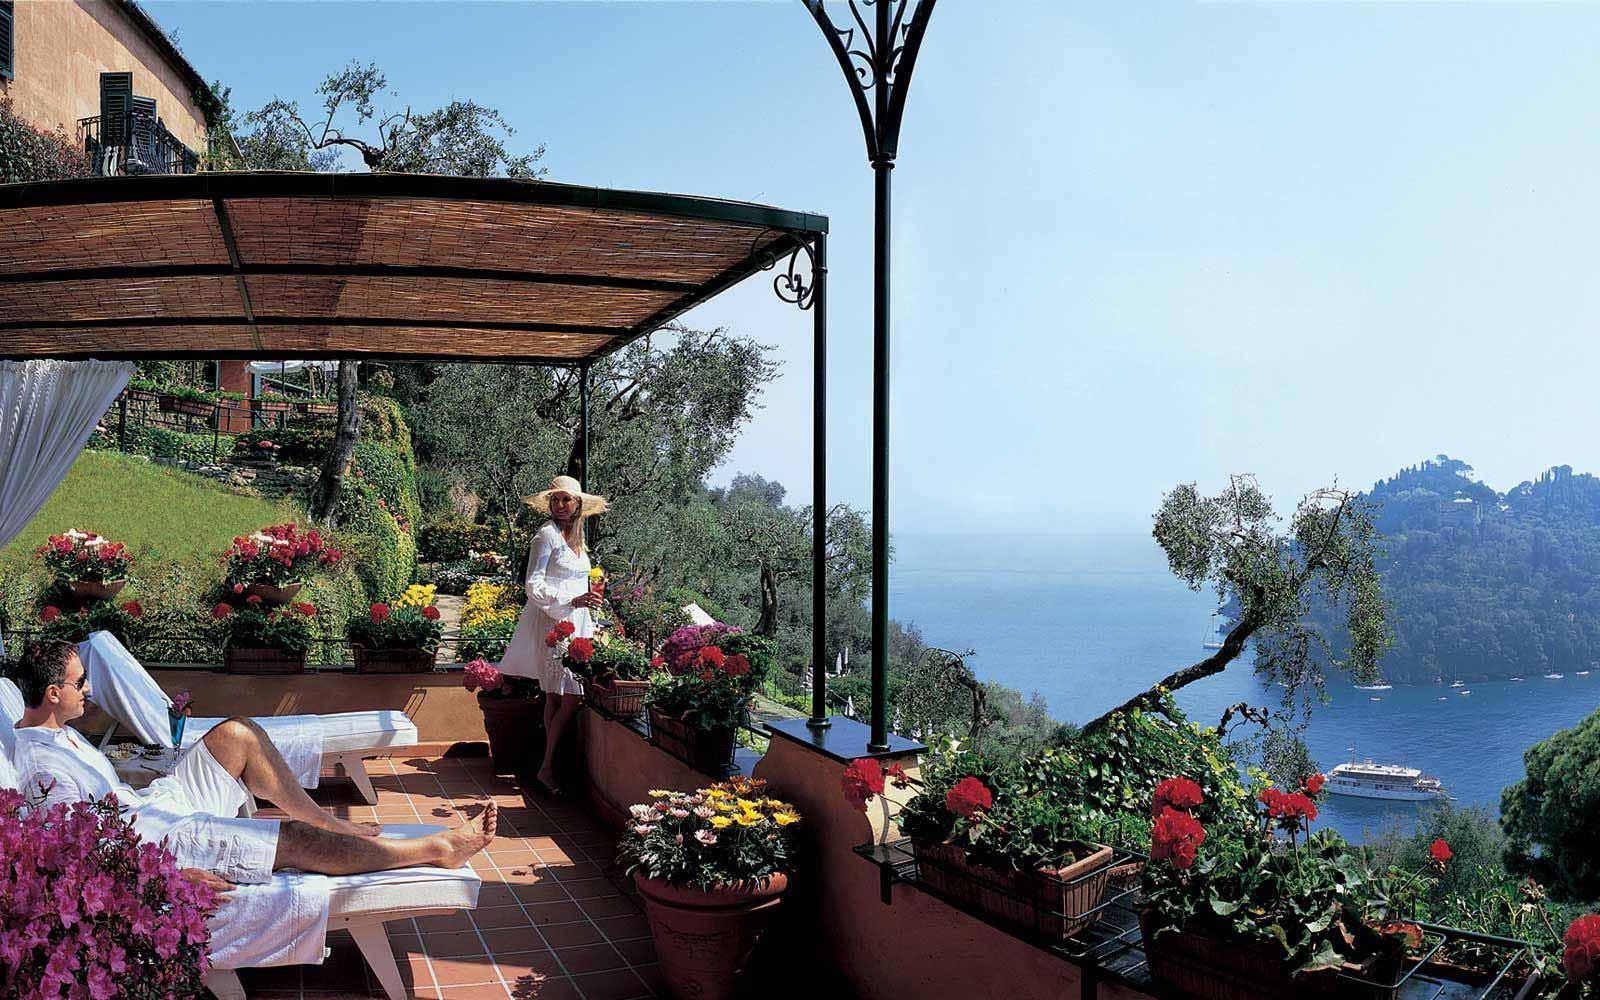 Terrace at Belmond Hotel Splendido & Splendido Mare